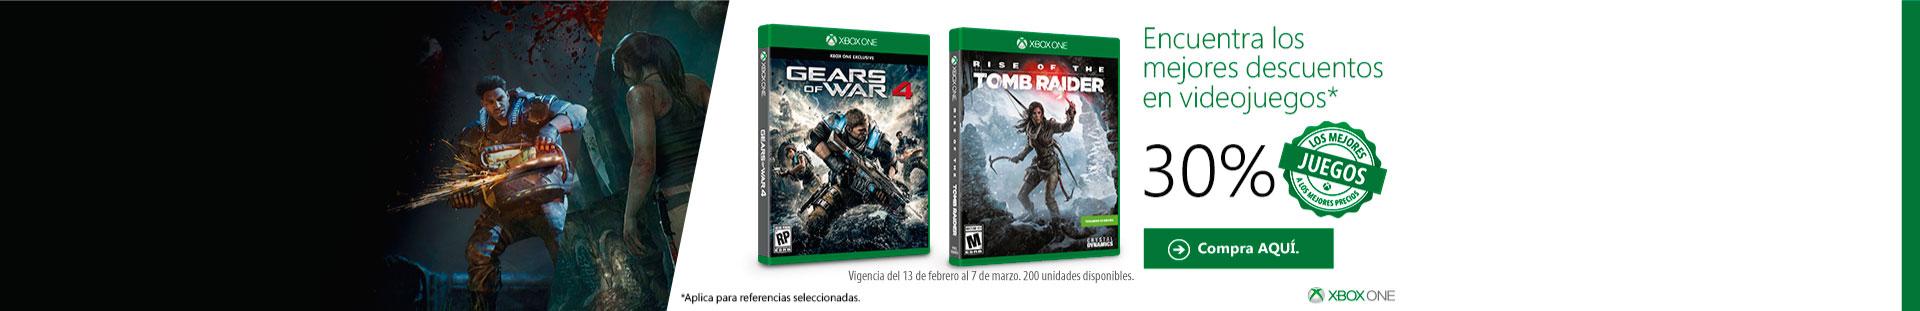 Descuentos videojuegos XBOX